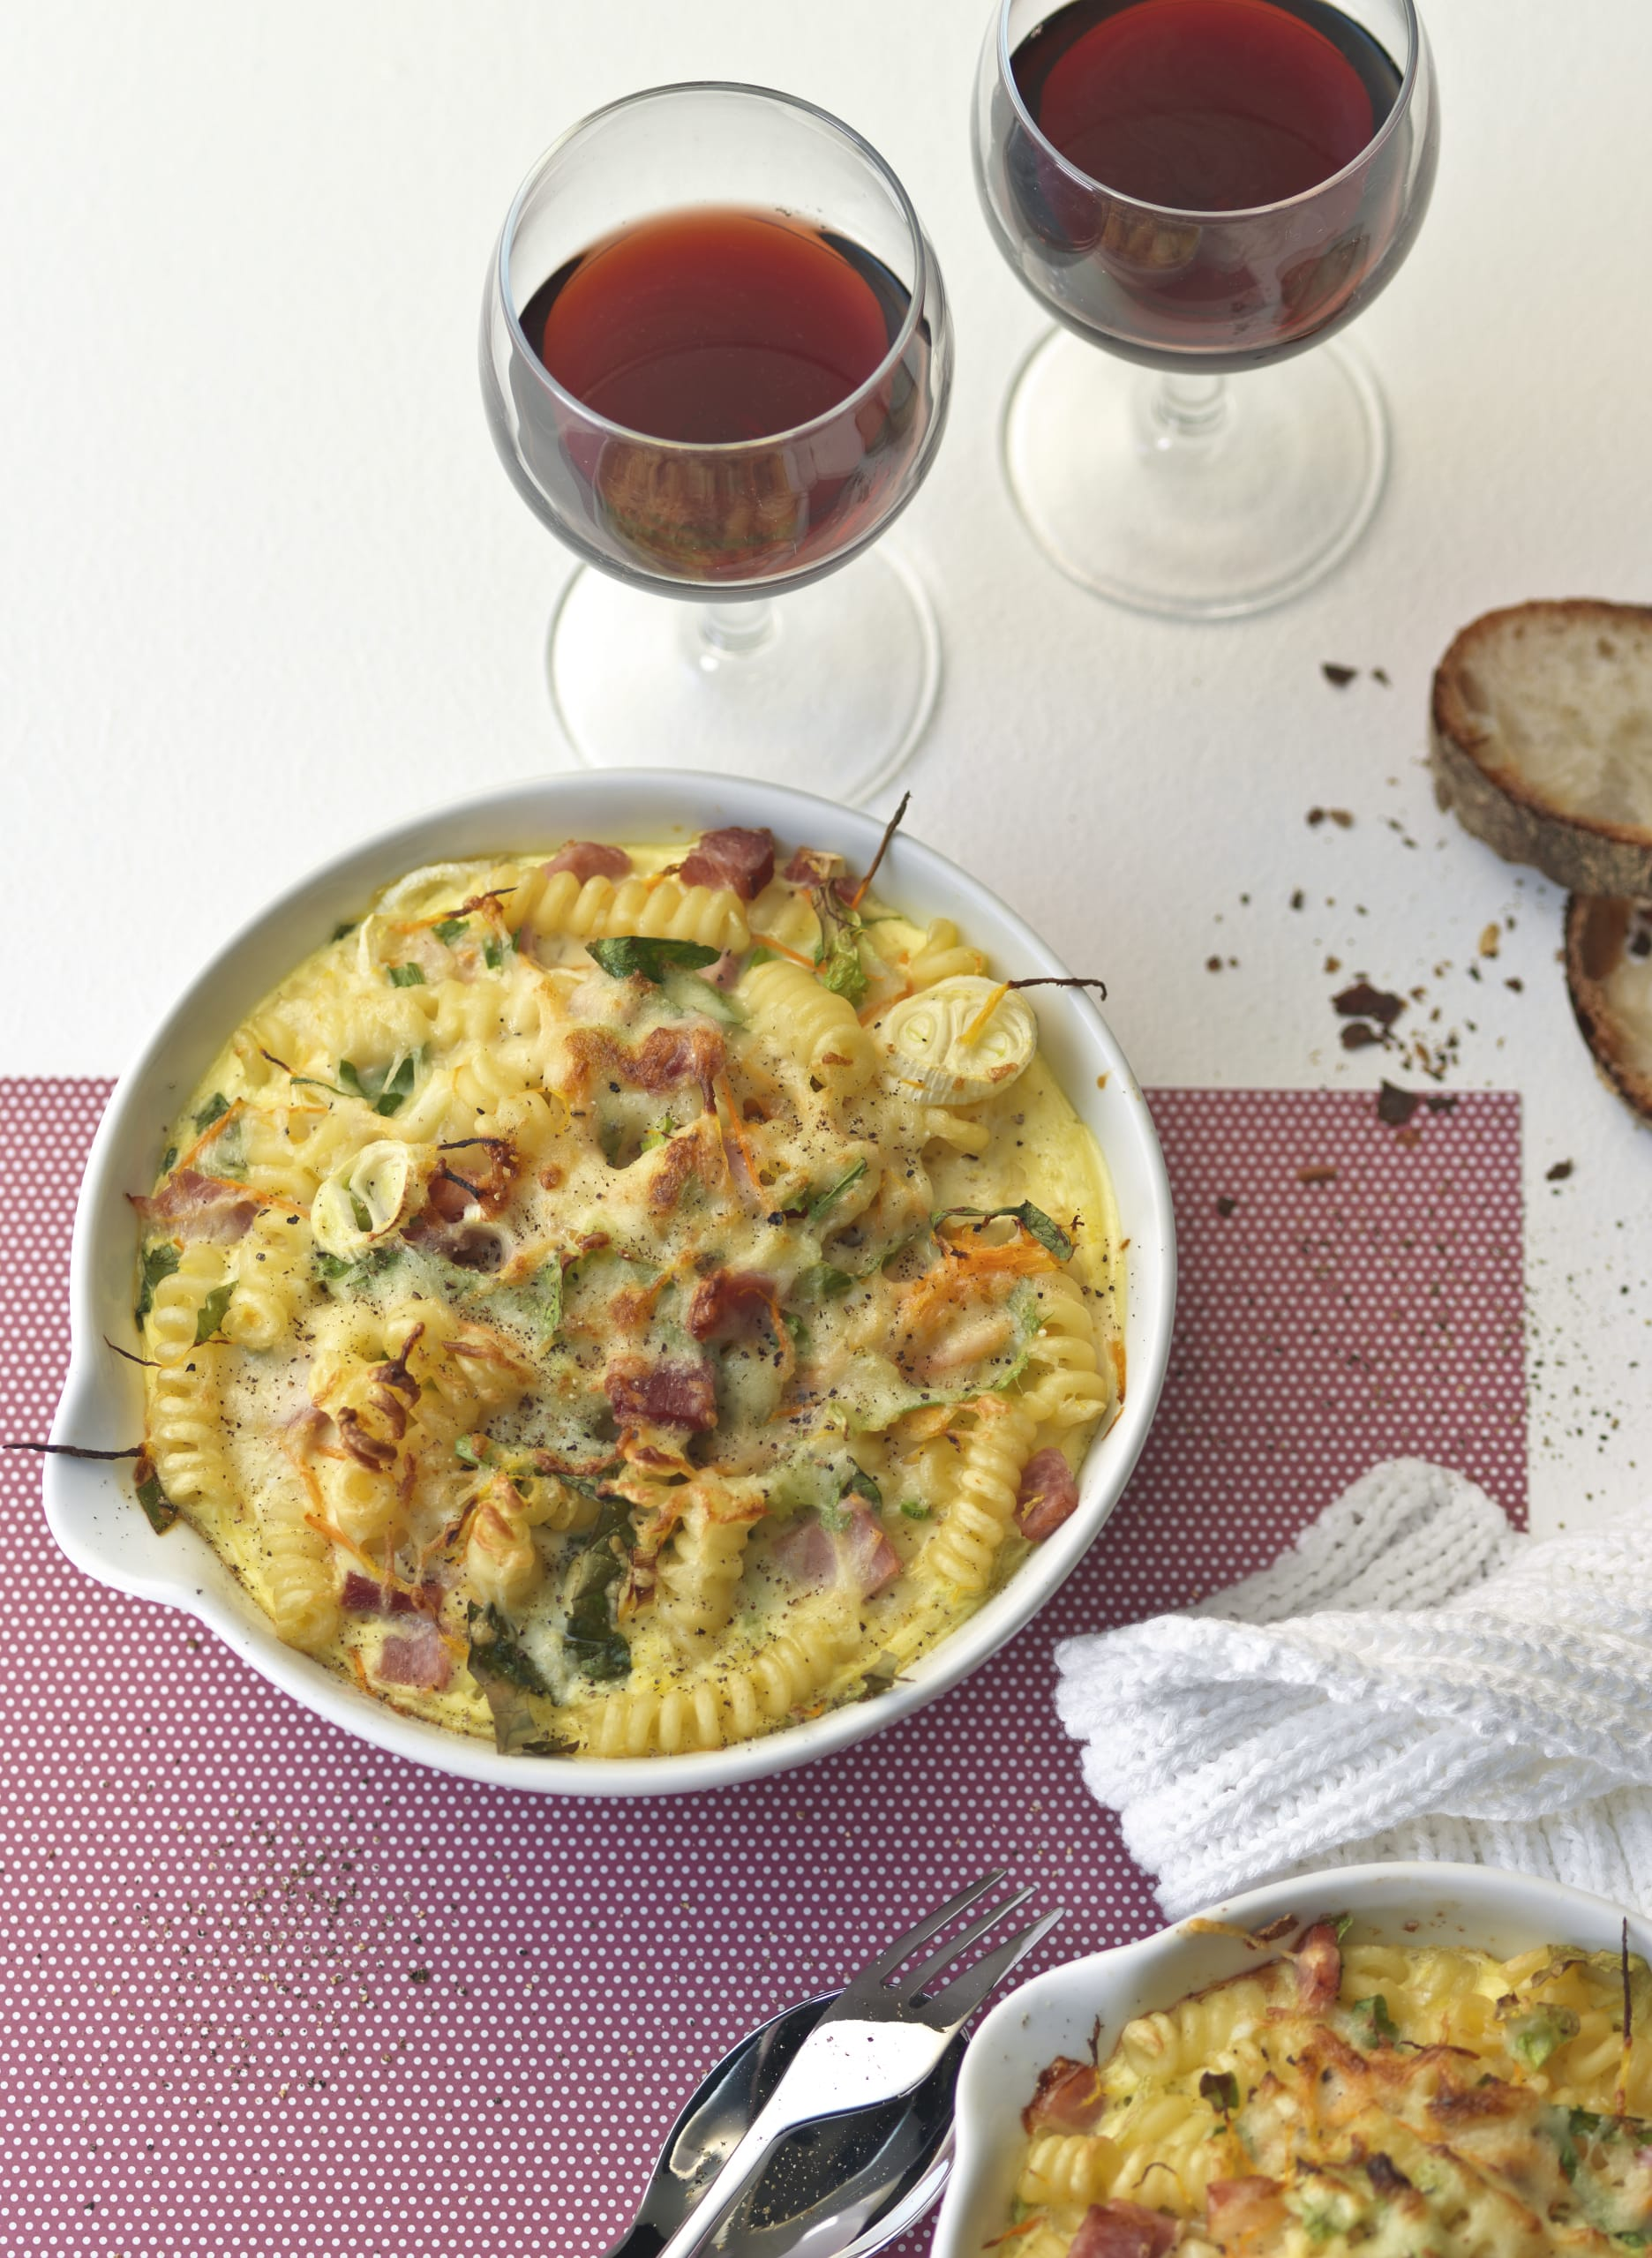 Teigwaren-Gemüse-Gratin mit Schinken